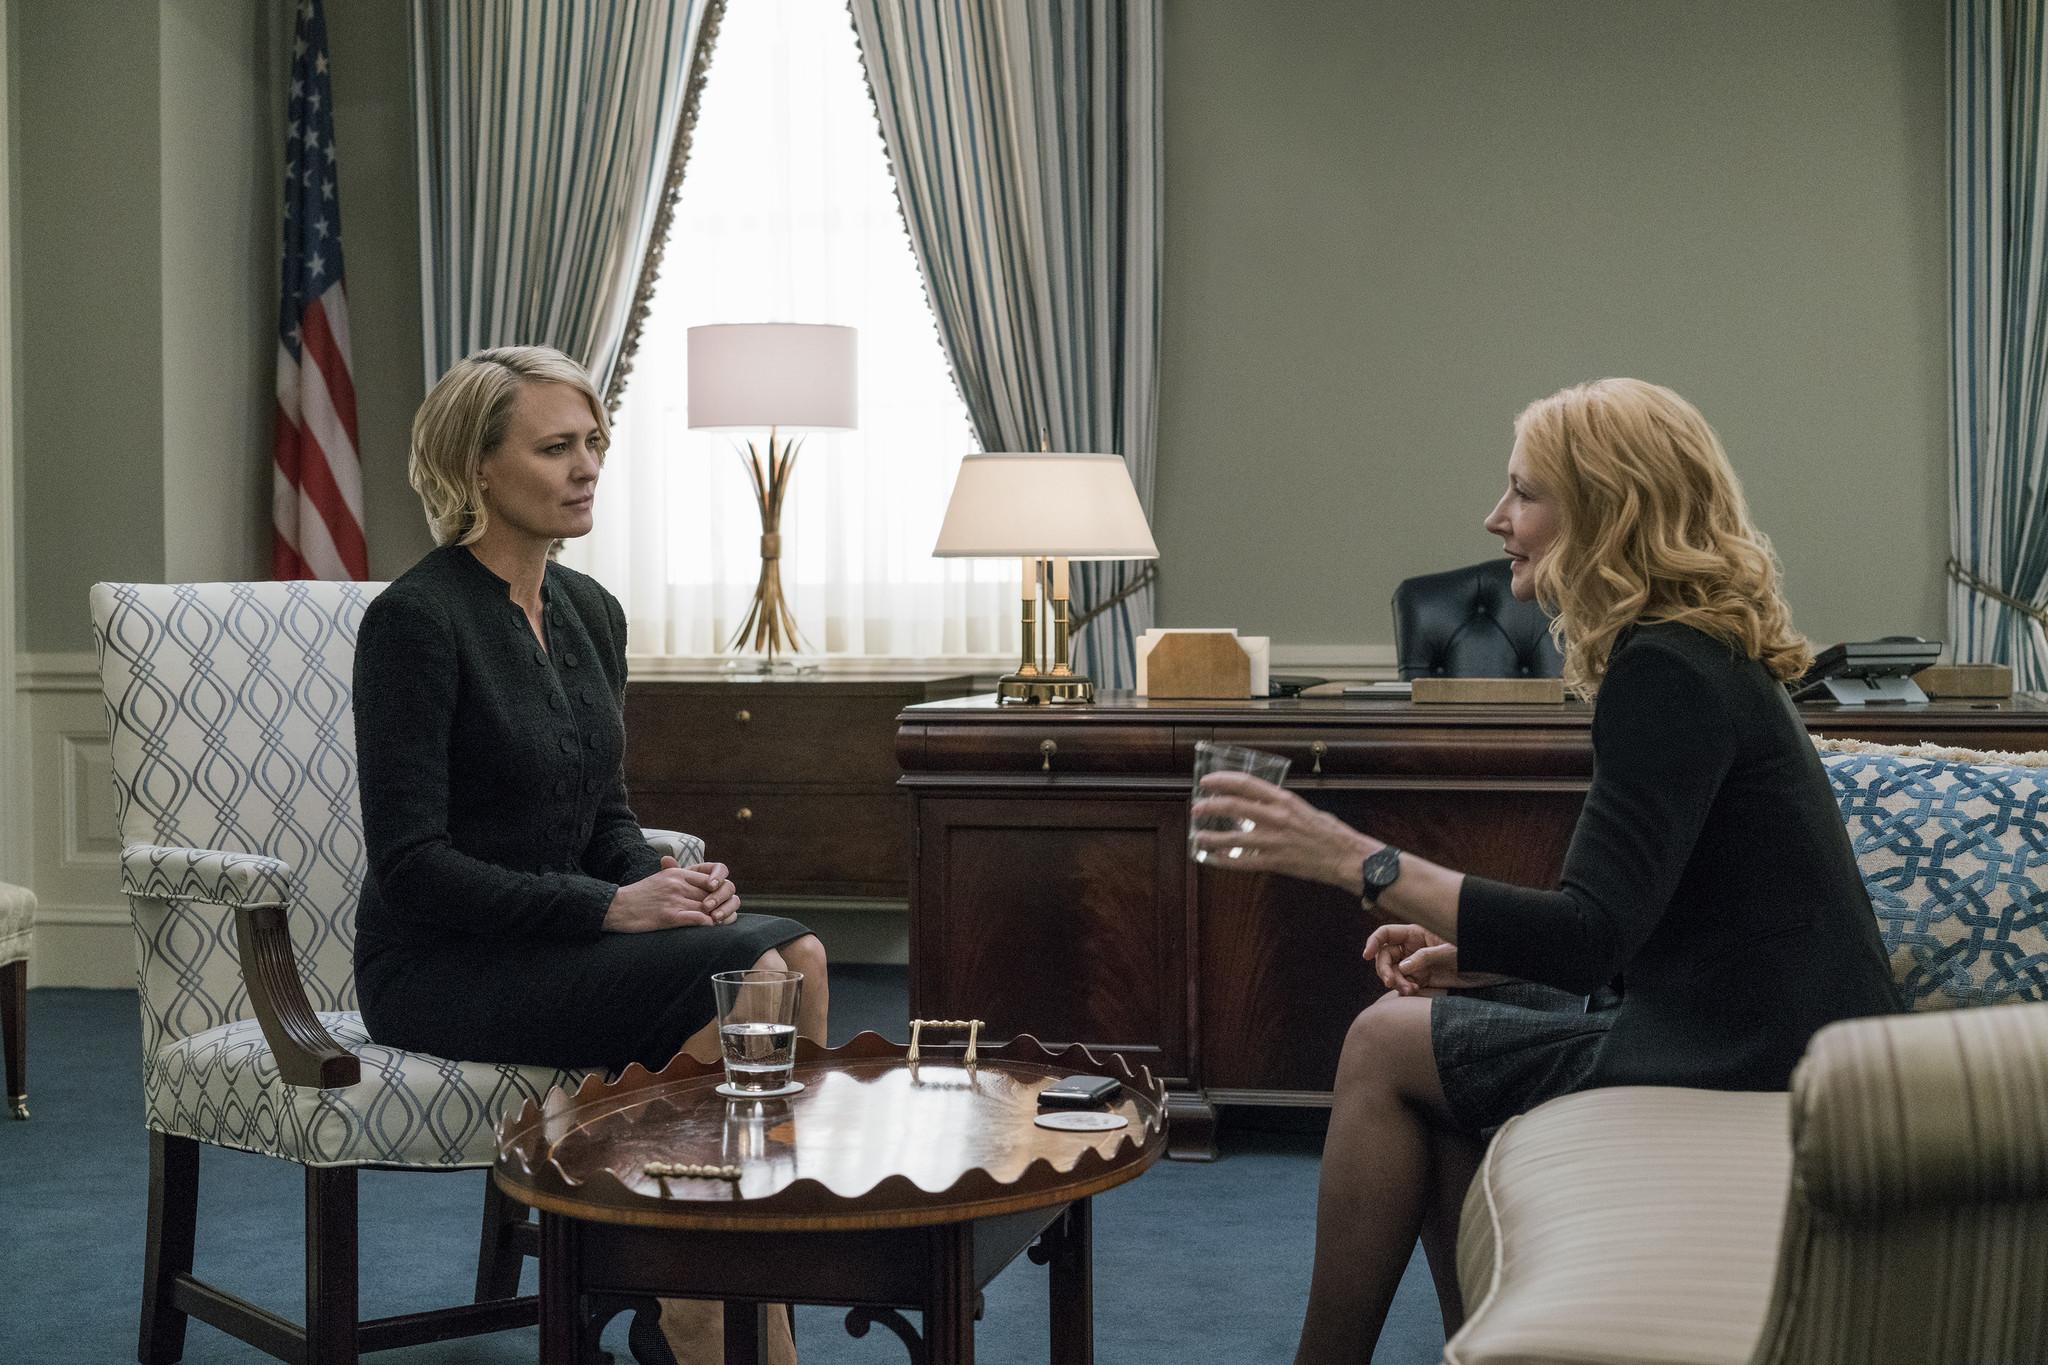 House Of Cards Season 5 Episode 10 Recap Bombshell Hearing